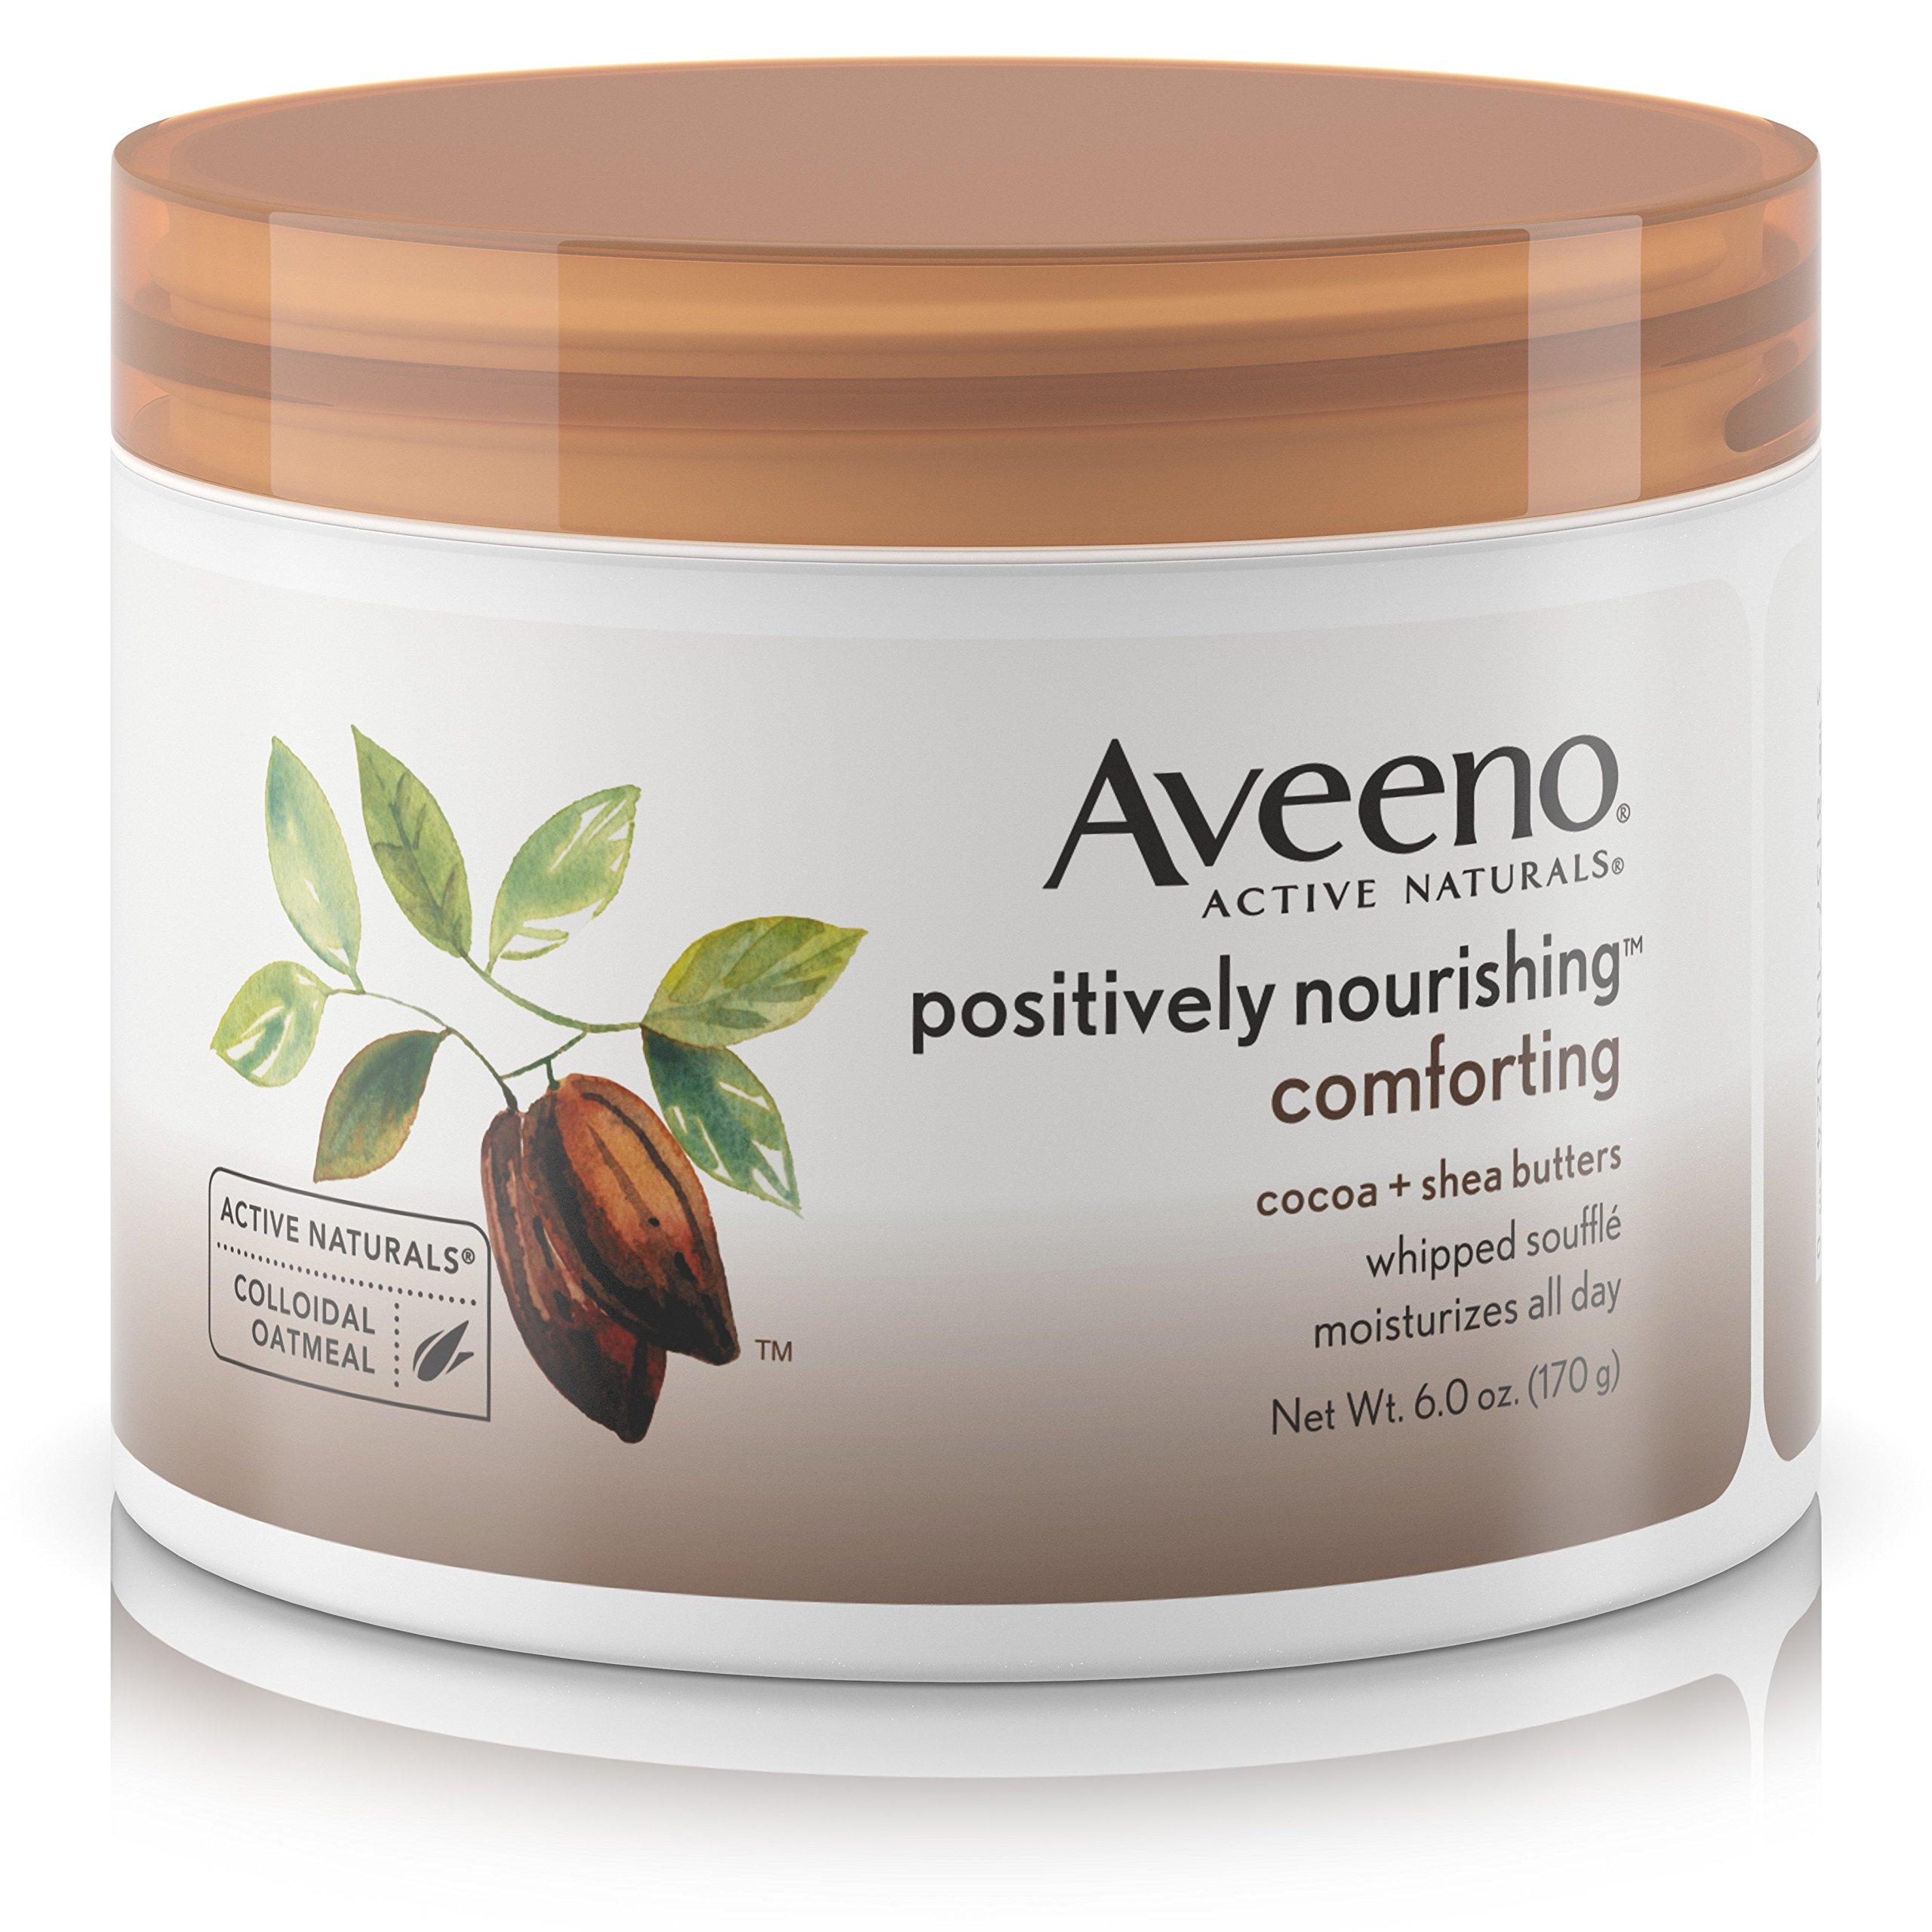 Aveeno Positively Nourishing Daily Moisturizer Comforting Whipped Soufflé, 6 Oz